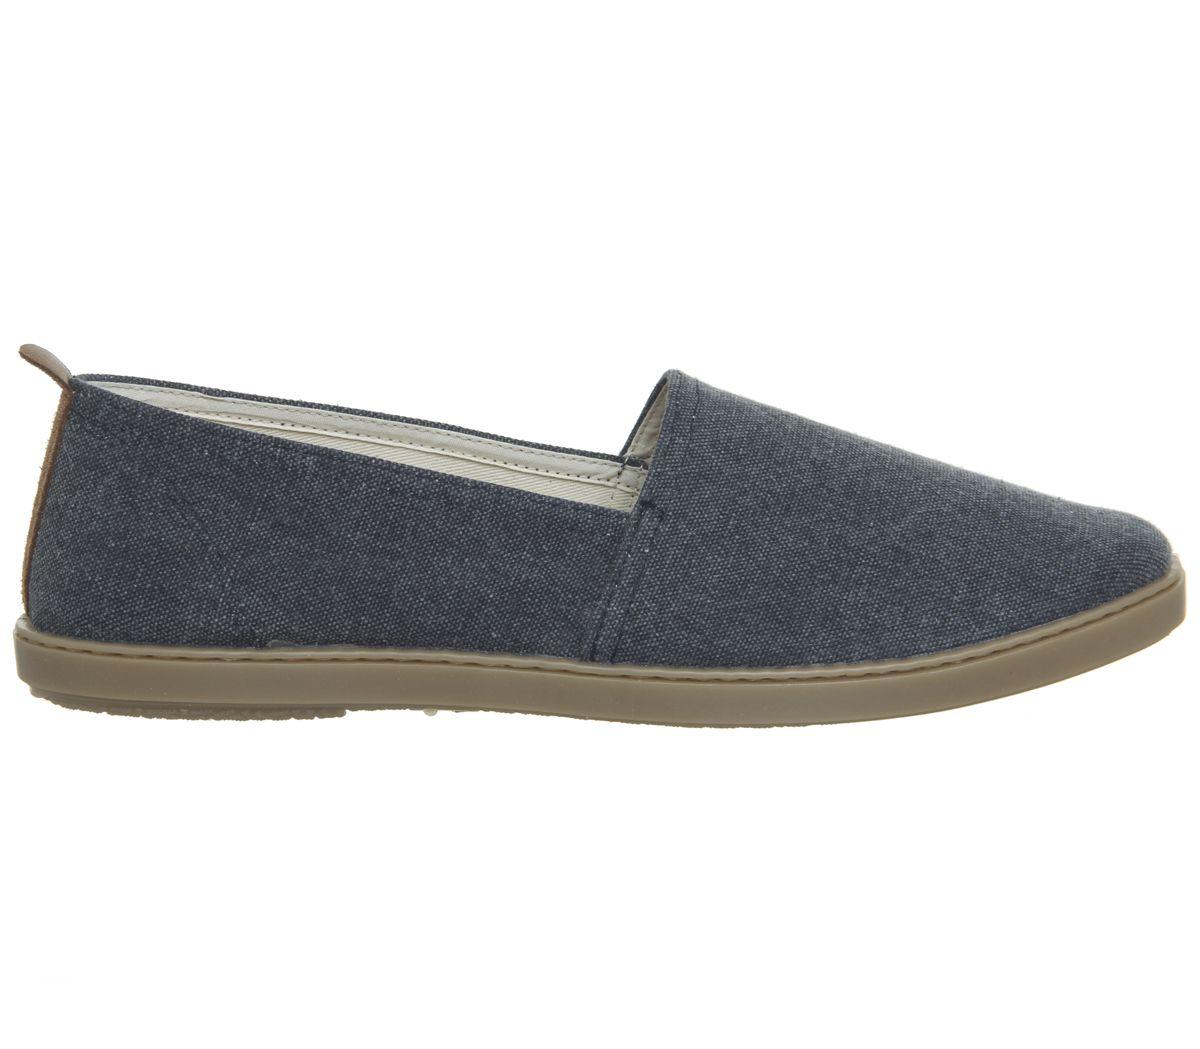 Lavado Office Alpargatas Marino Hombre Azul Hanoi Zapatos W2DHI9EY